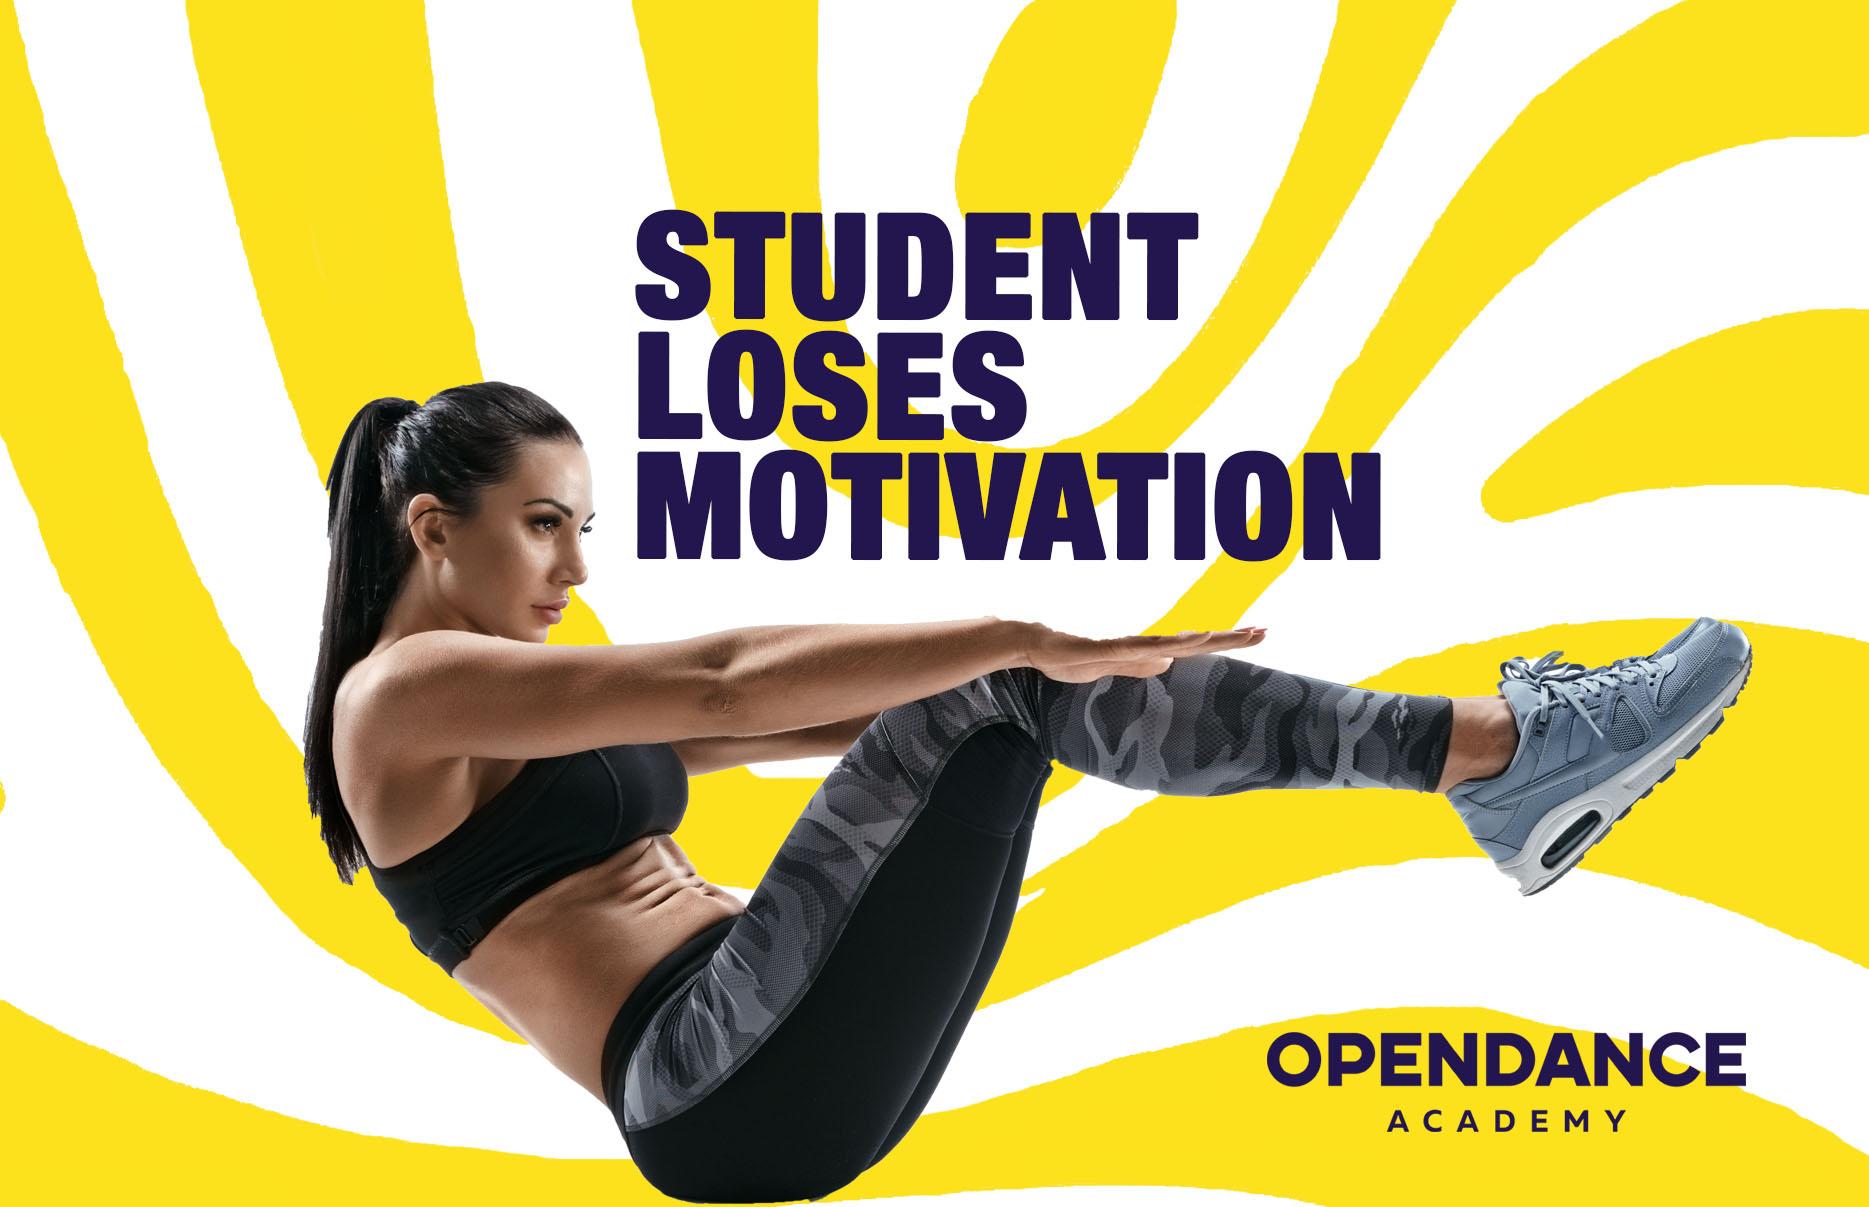 Student Loses Motivation